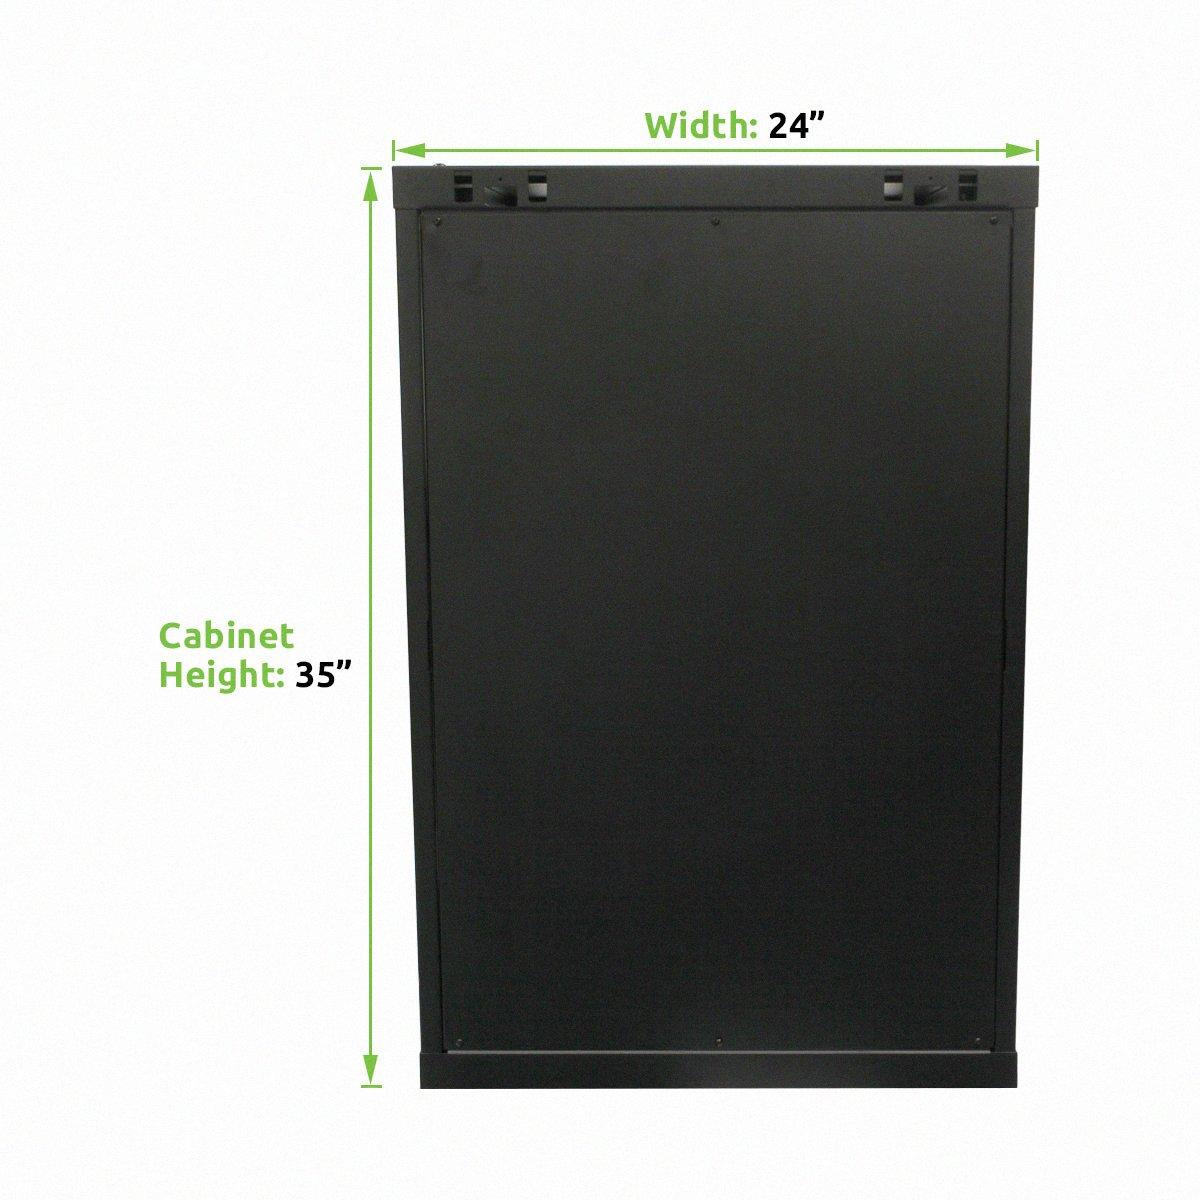 Amazon.com: Navepoint 18U Deluxe IT Wallmount Cabinet Enclosure 19 ...